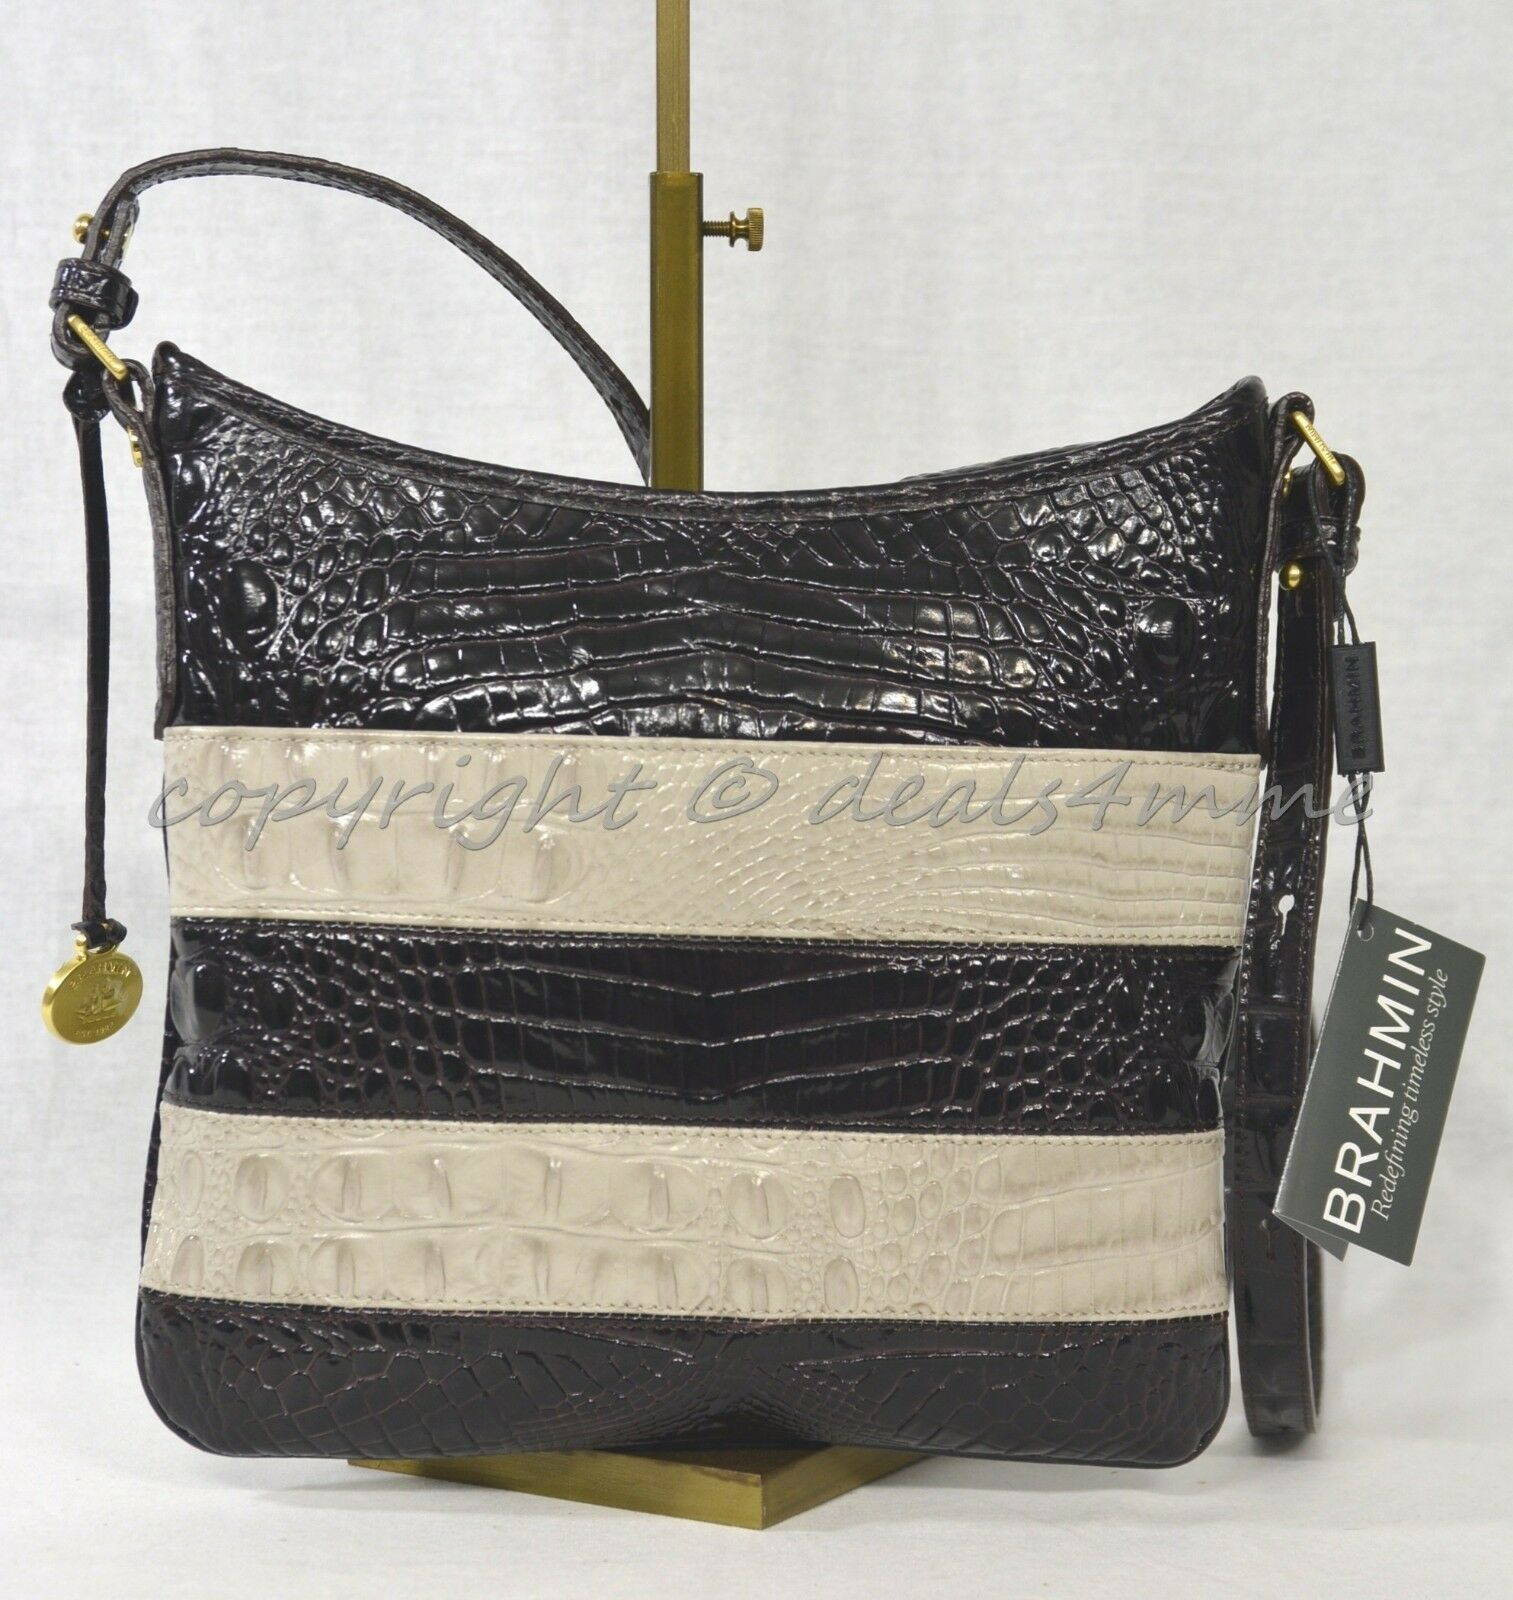 NWT Brahmin Jody Striped Cross-Body/Shoulder Bag in Angora Vineyard image 4